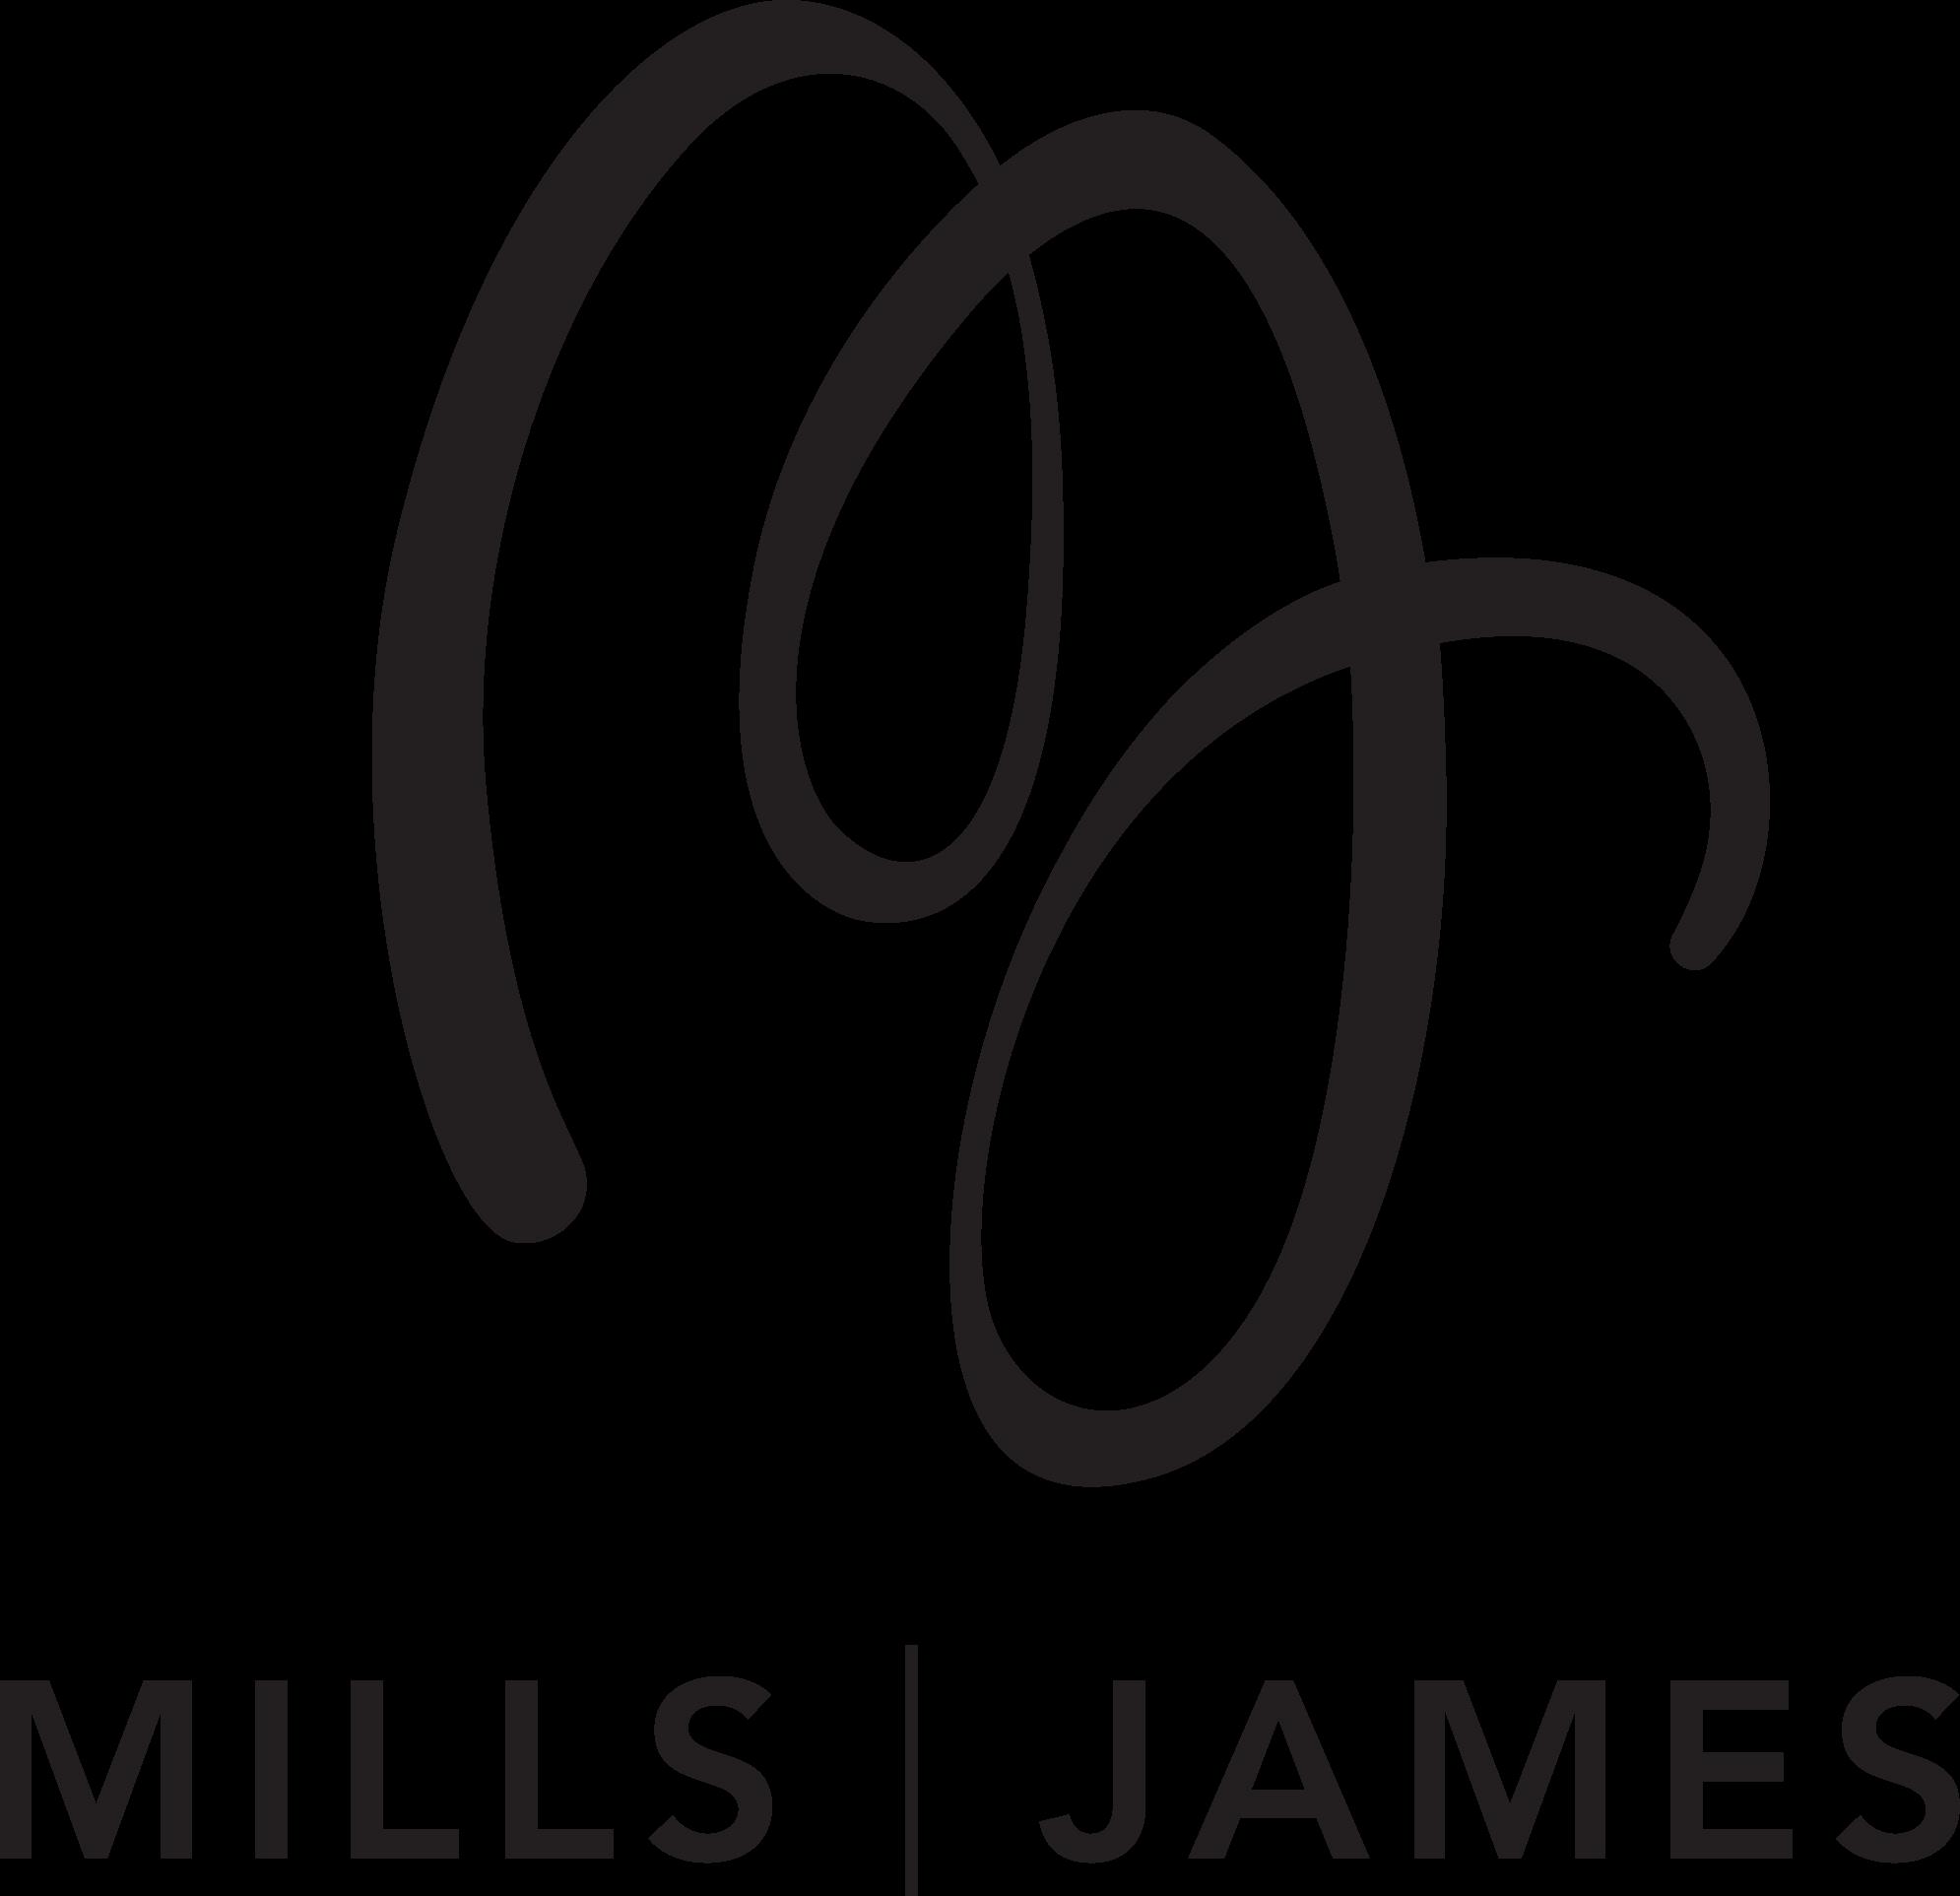 millsjames Logo